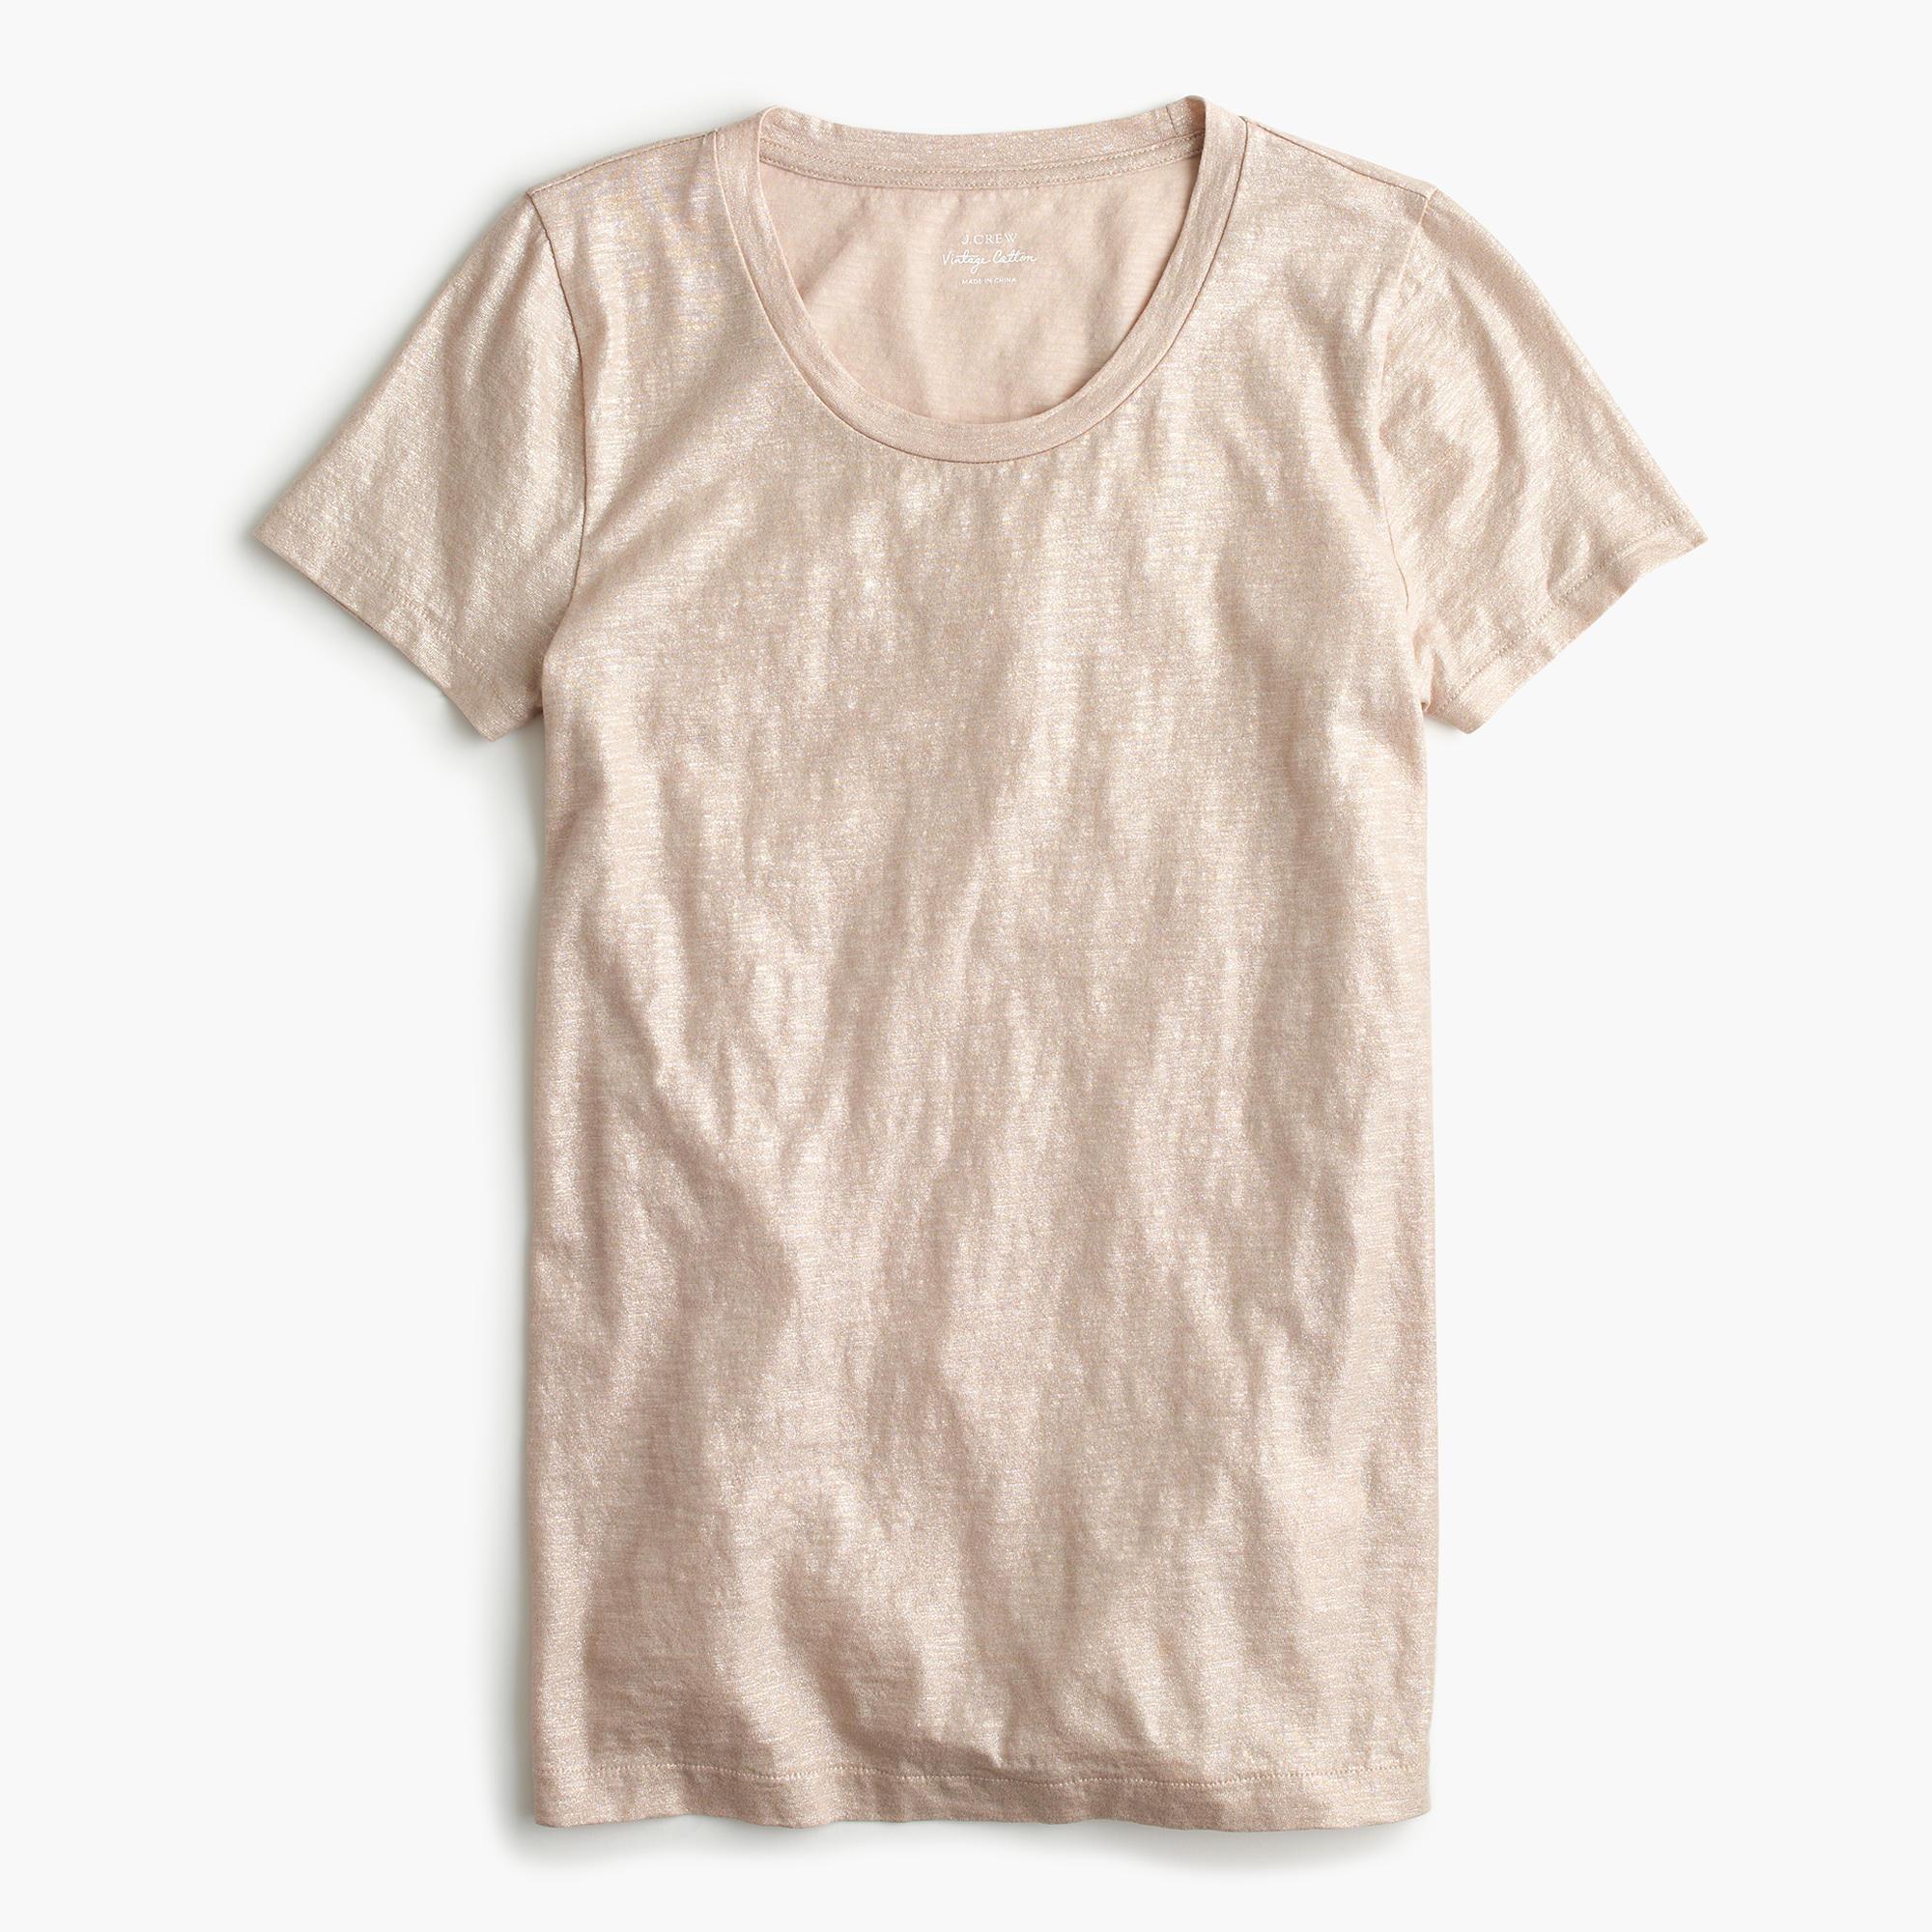 Vintage music T-shirts inc: John Lennon T-Shirts, Frank Zappa T-Shirts. Pink Floyd T-Shirts, James Brown T-Shirts, Kurt Cobain T-Shirt, Gram Parsons T-Shirt.